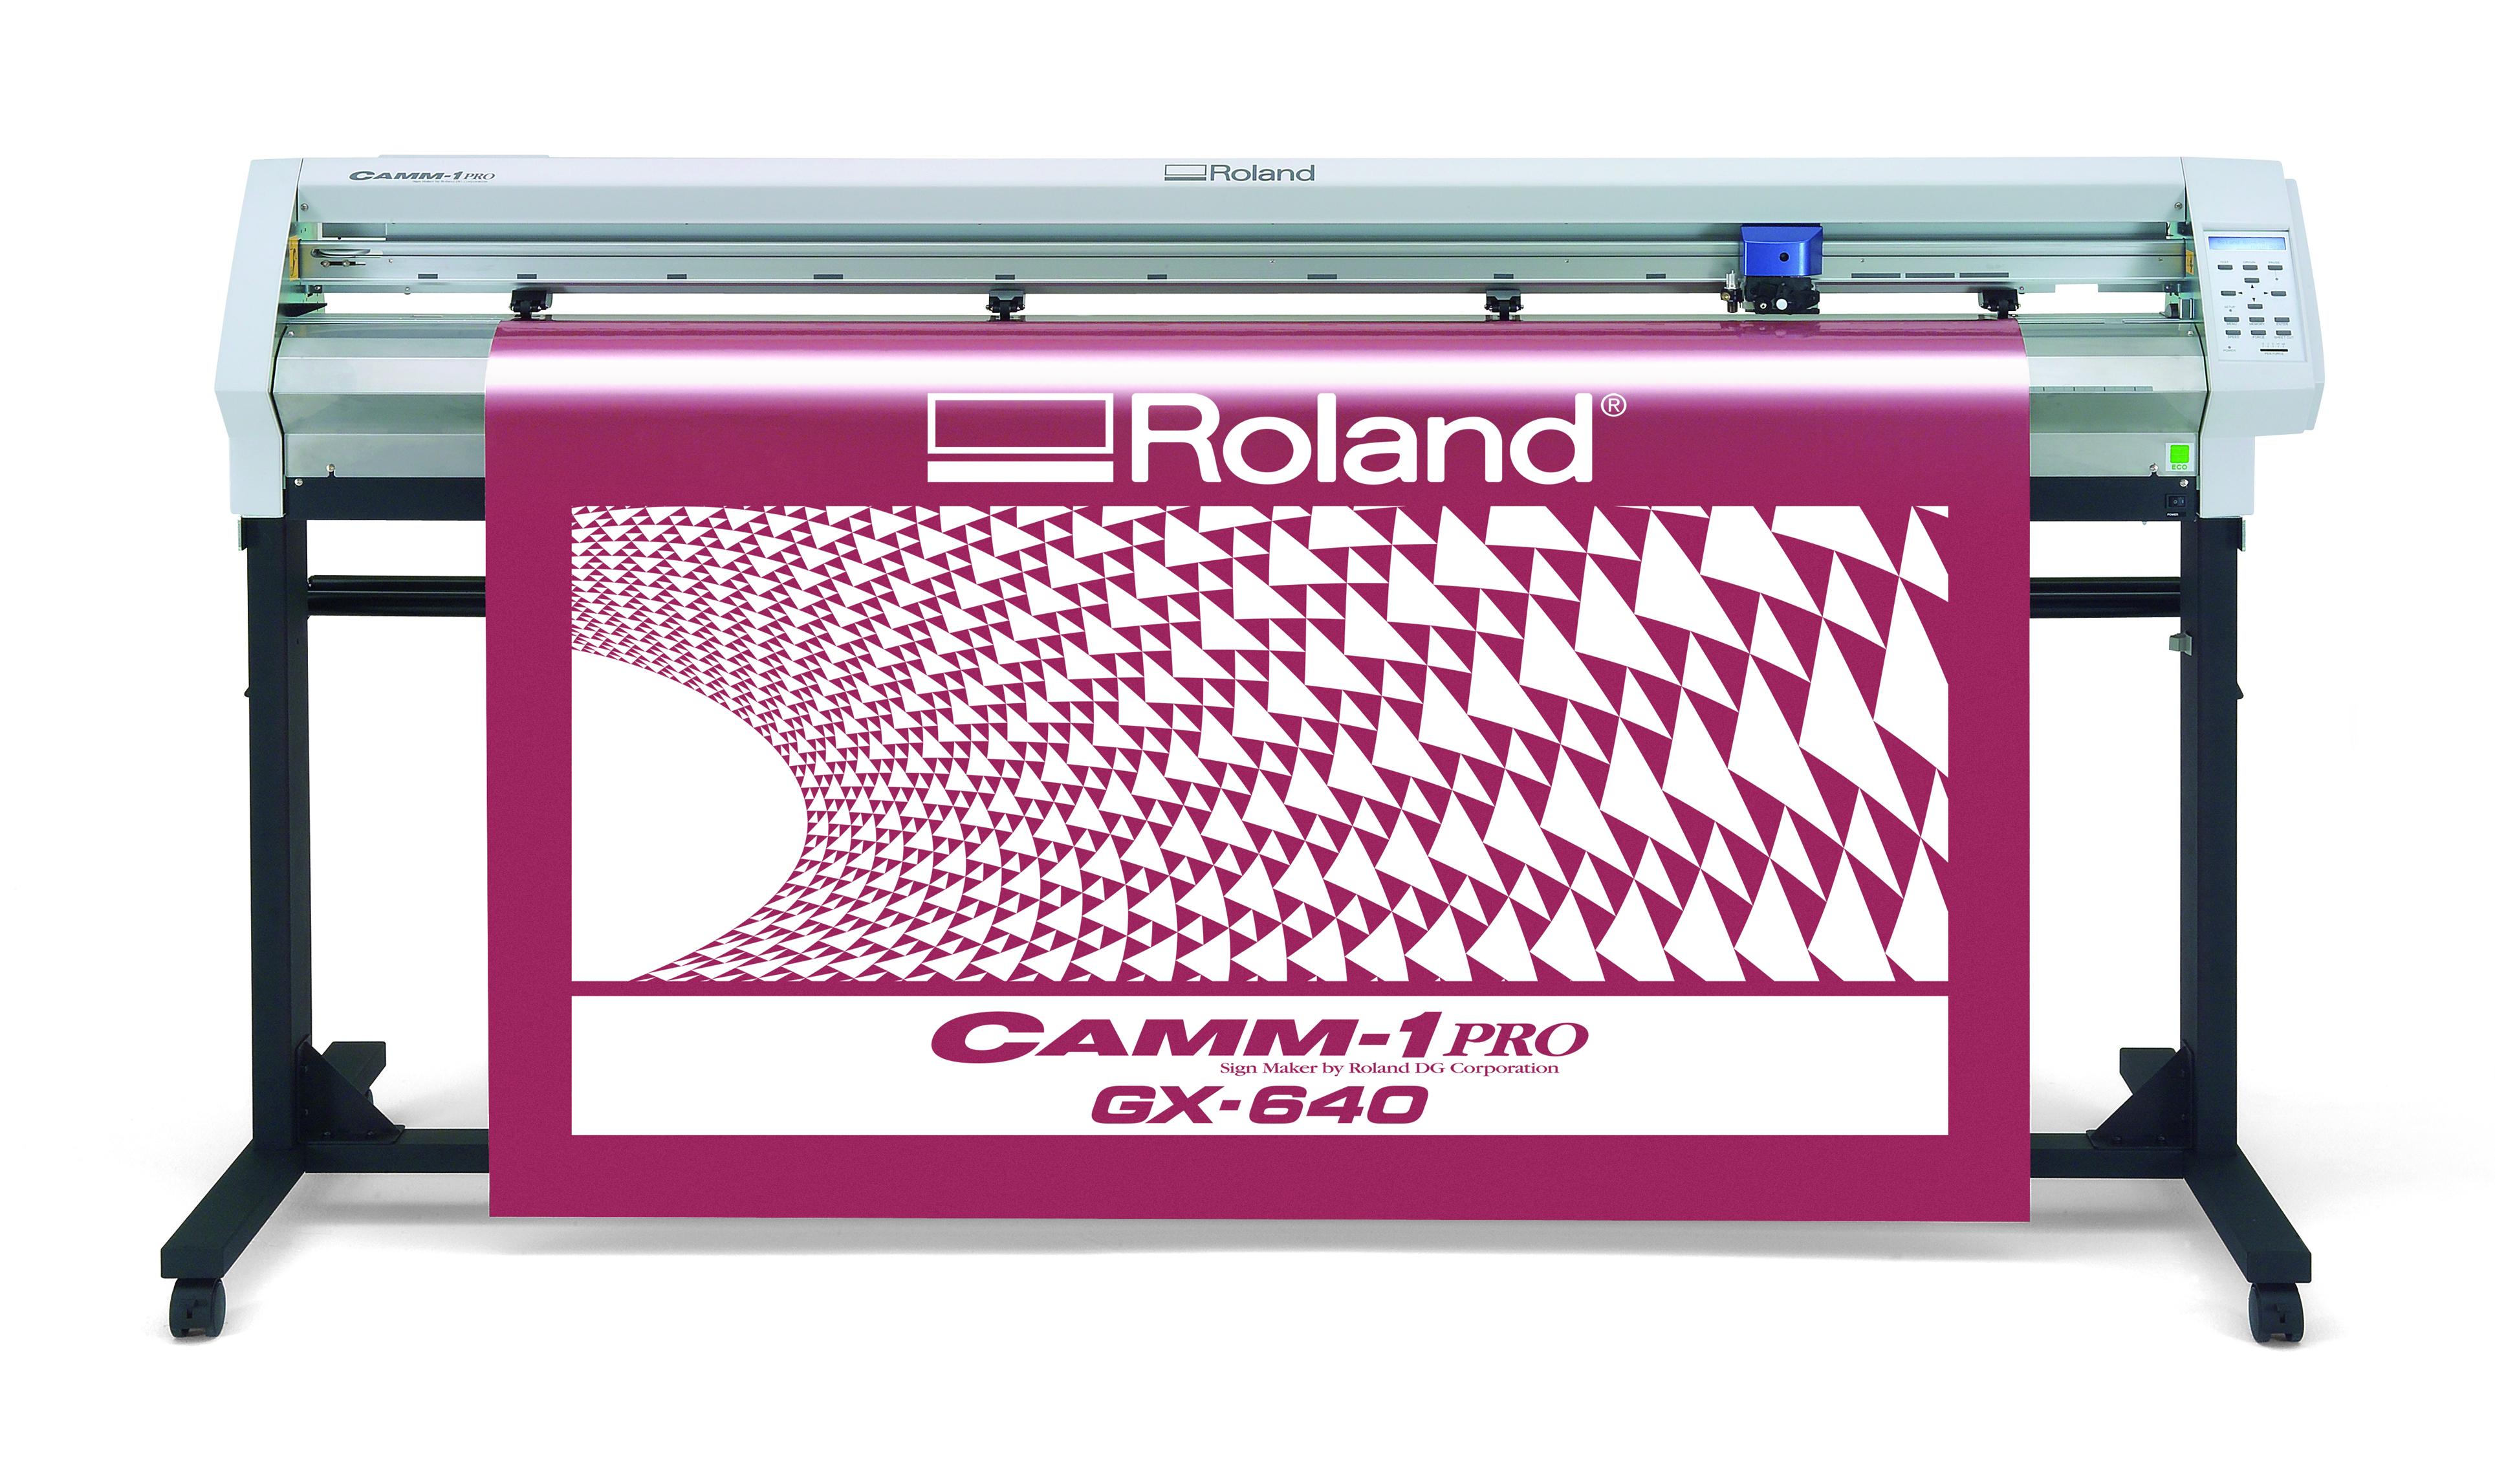 Roland camm 1 pro